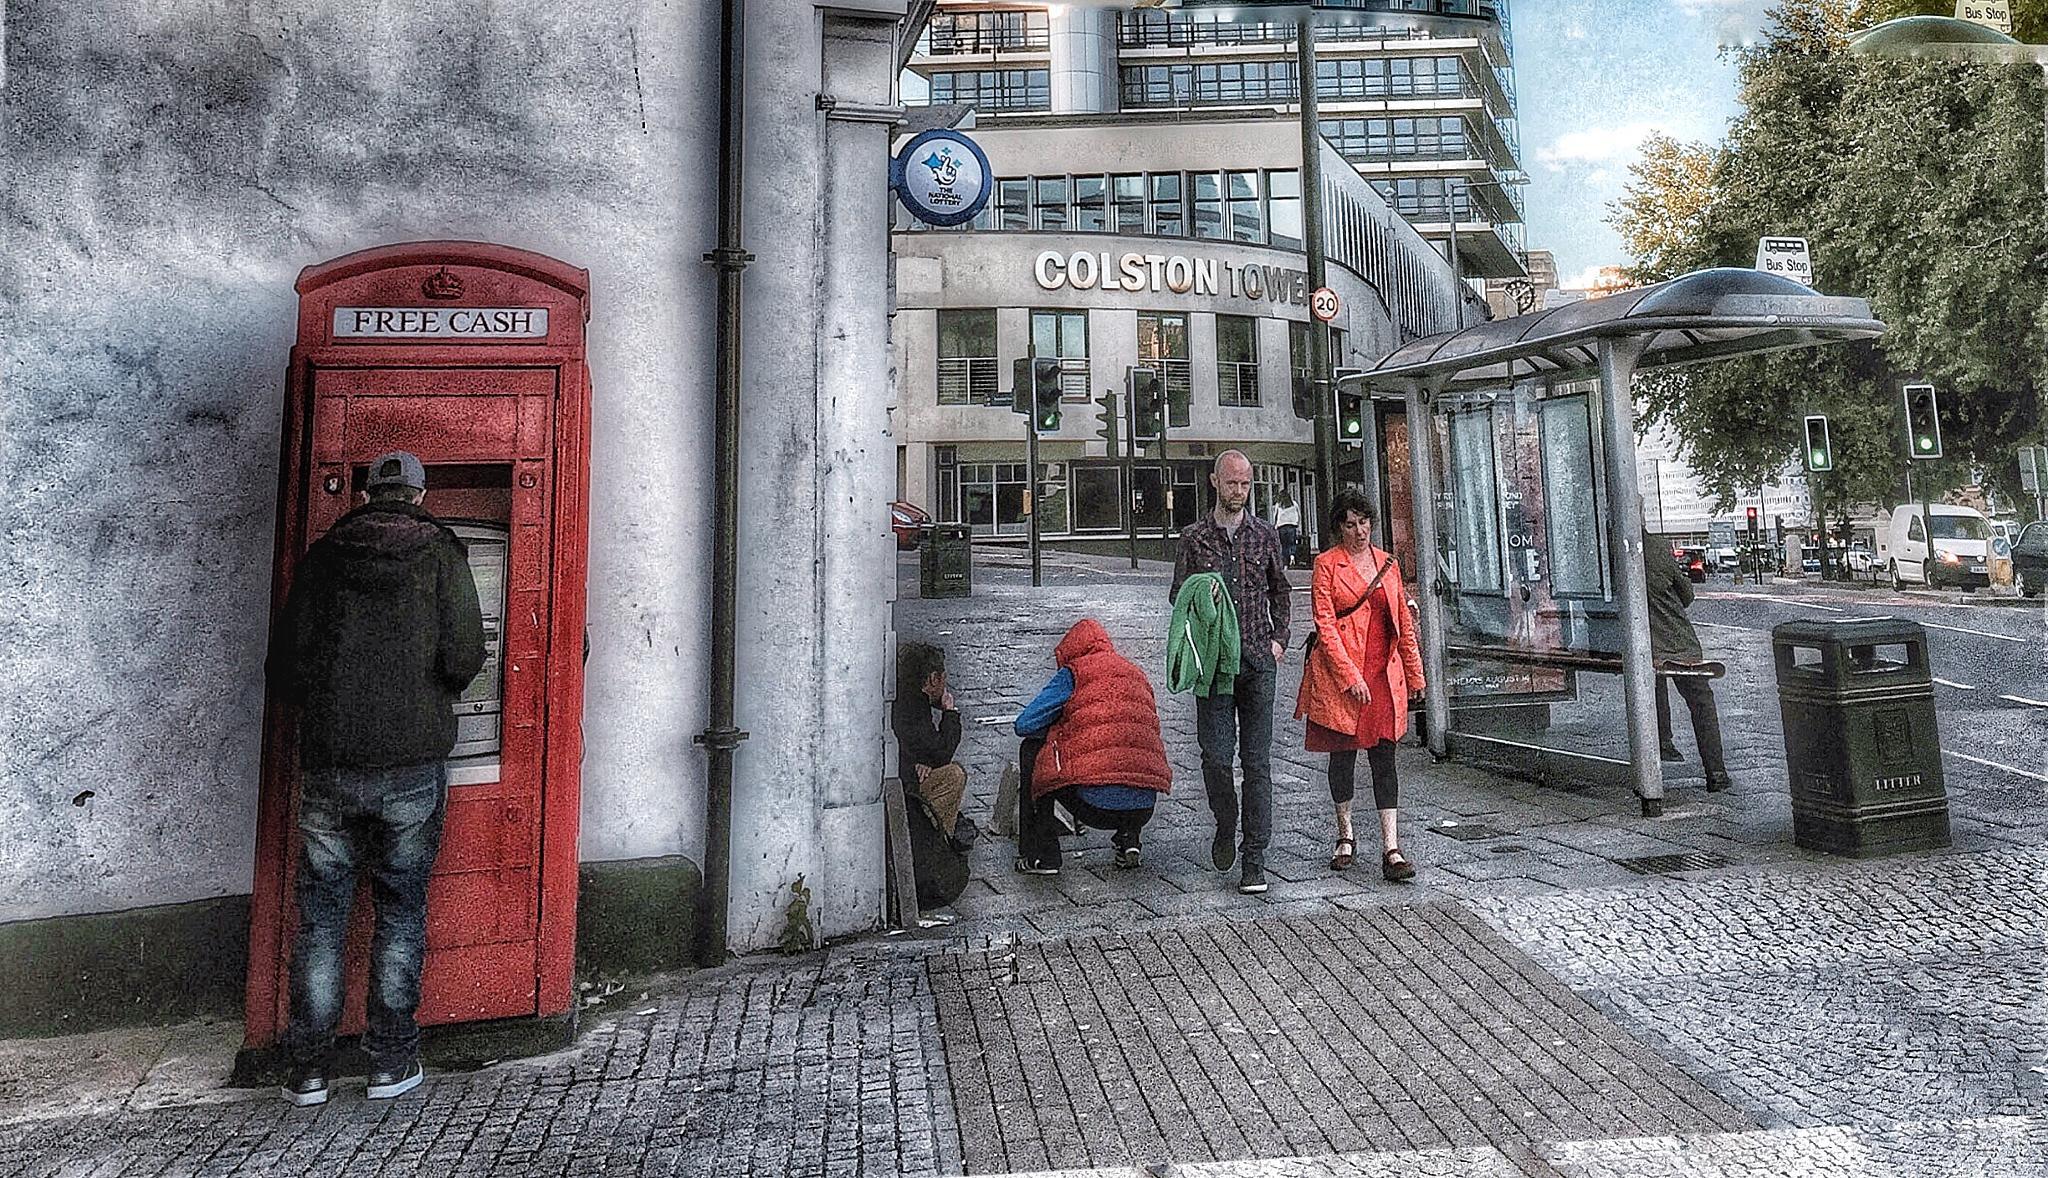 Free cash by John John McLane Freelance photographer